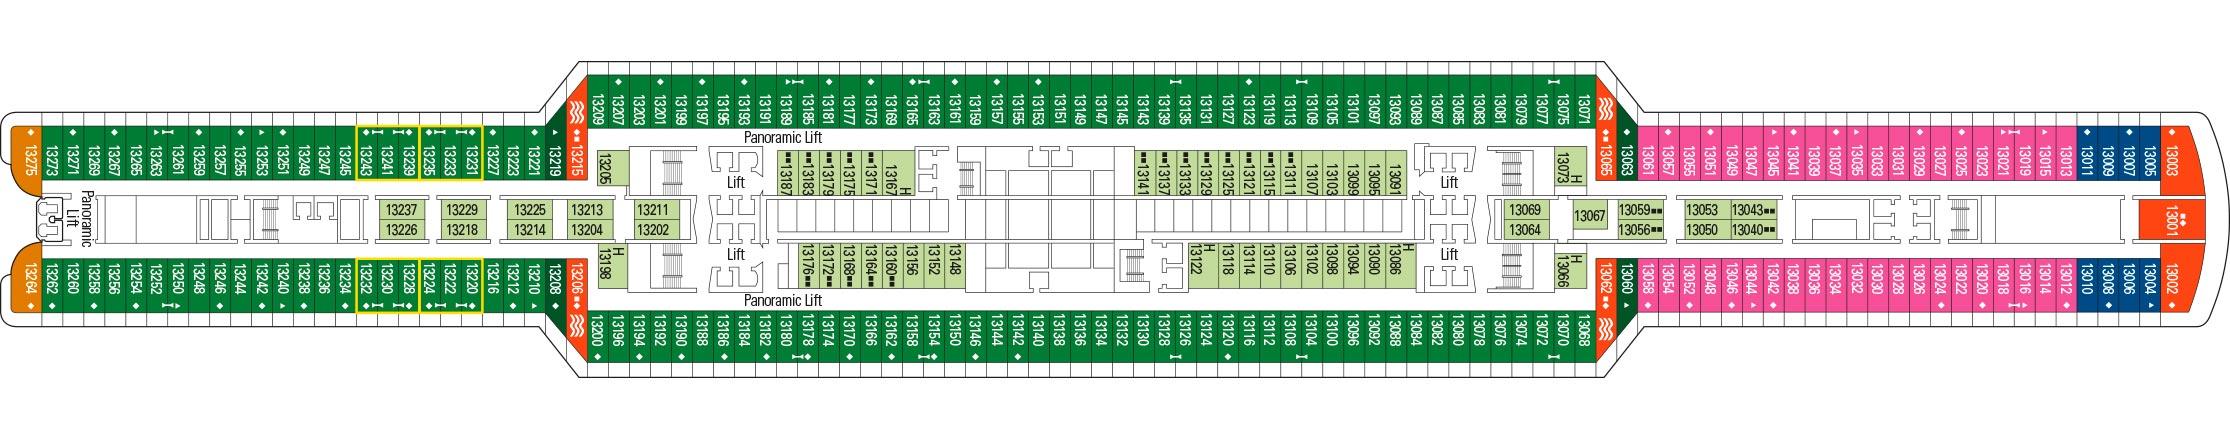 MSC Cruises MSC Seaview Deckplans Deck 13.jpg